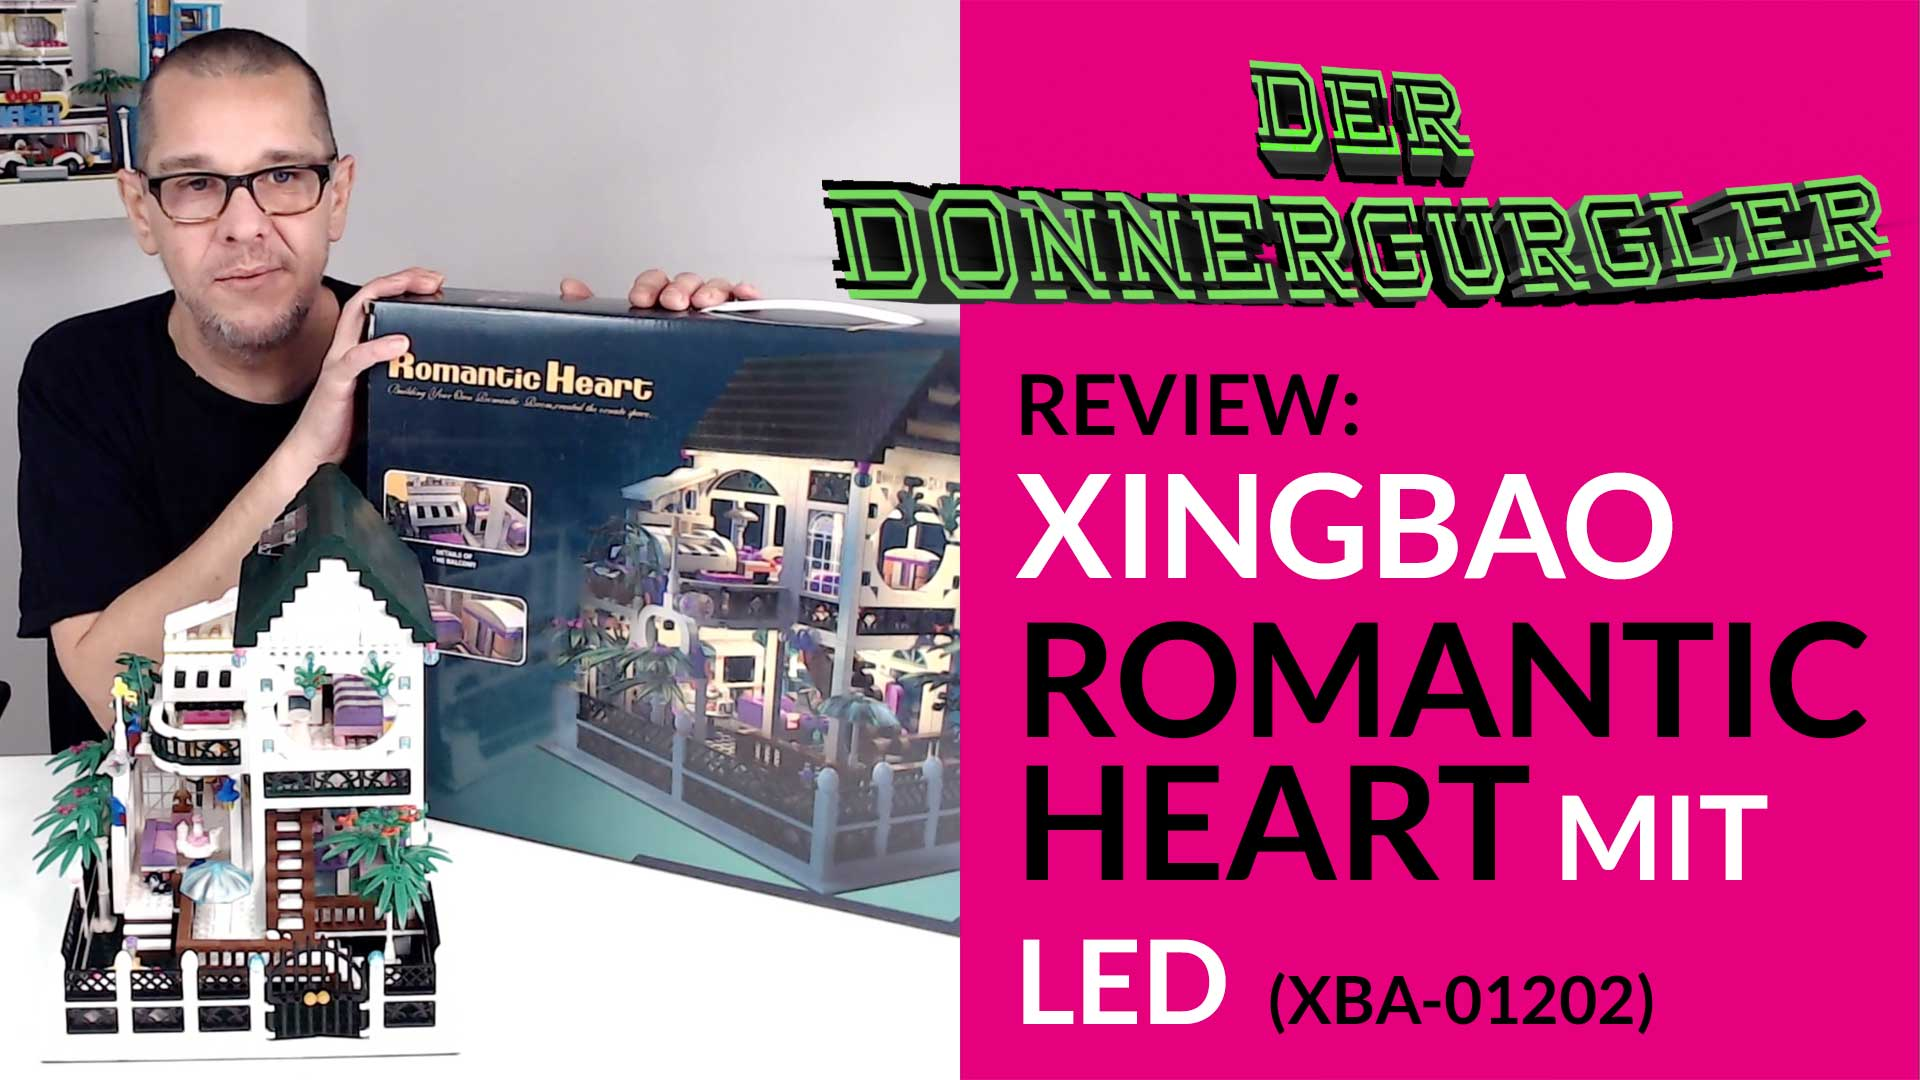 Xingabao Romantic Heart mit LED - Kitsch Romantik trieft aus allen Bricks